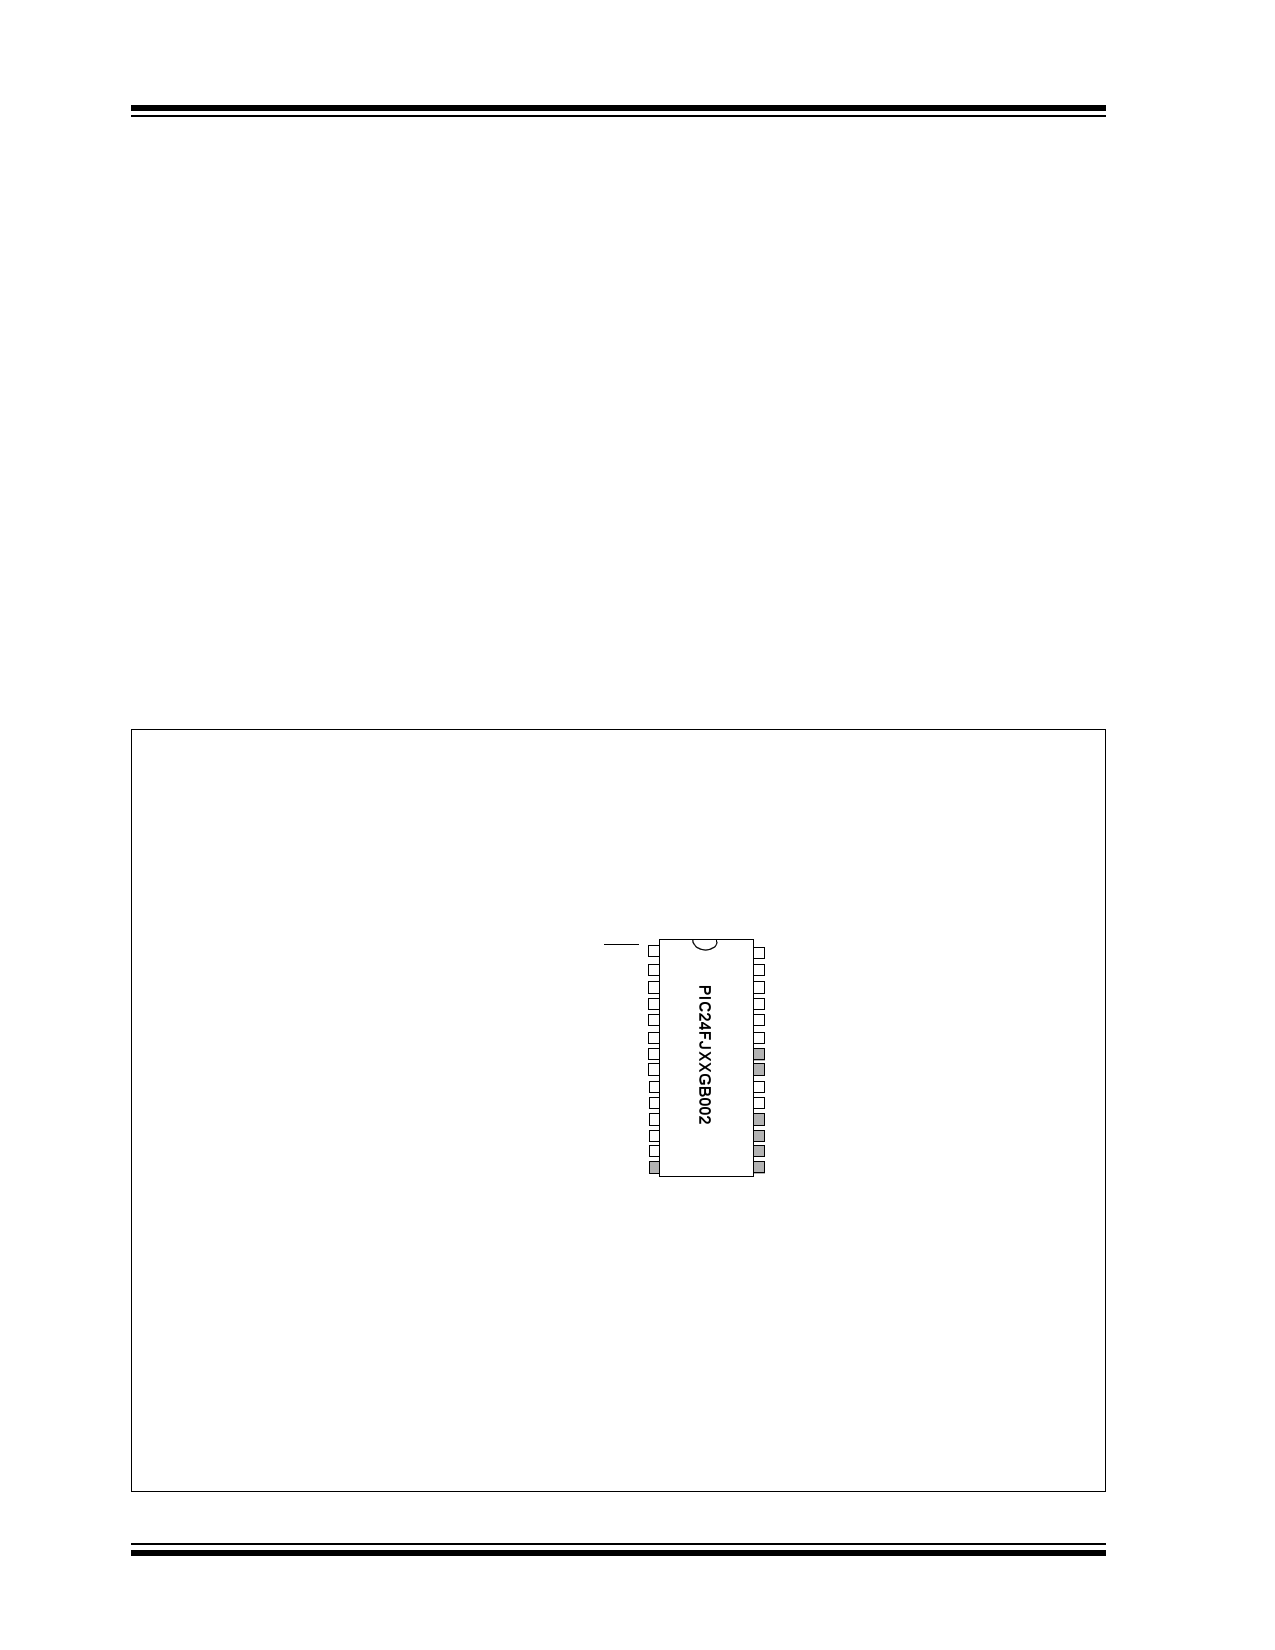 PIC24FJ64GB004 pdf, 반도체, 판매, 대치품